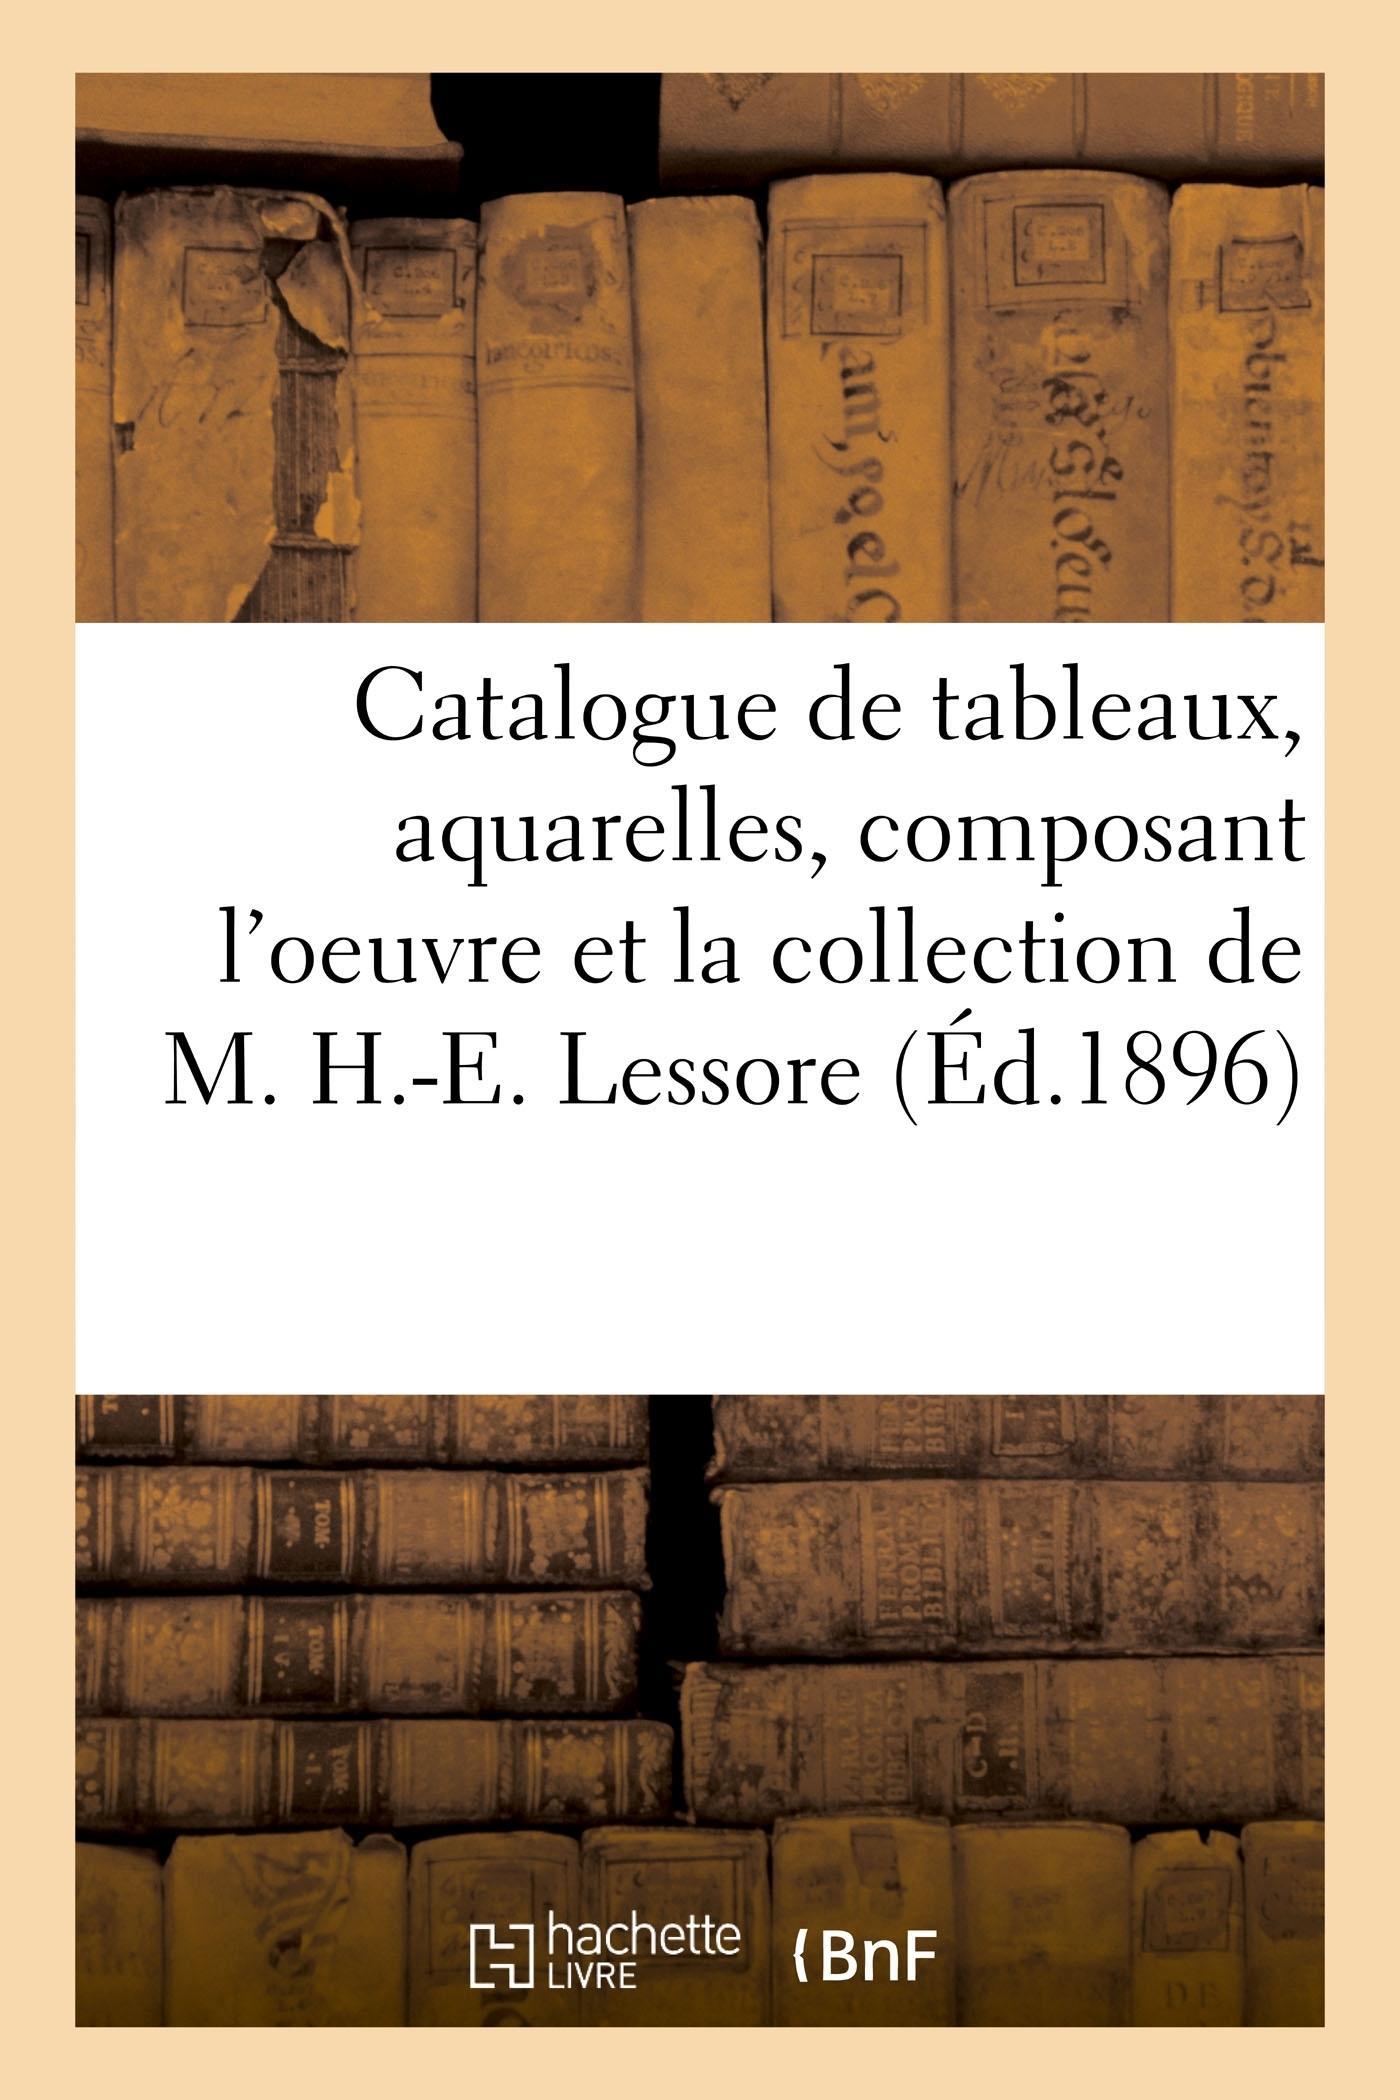 CATALOGUE DE TABLEAUX, AQUARELLES, DESSINS, LIVRES, ESTAMPES ANCIENNES ET MODERNES - COMPOSANT L'OEU